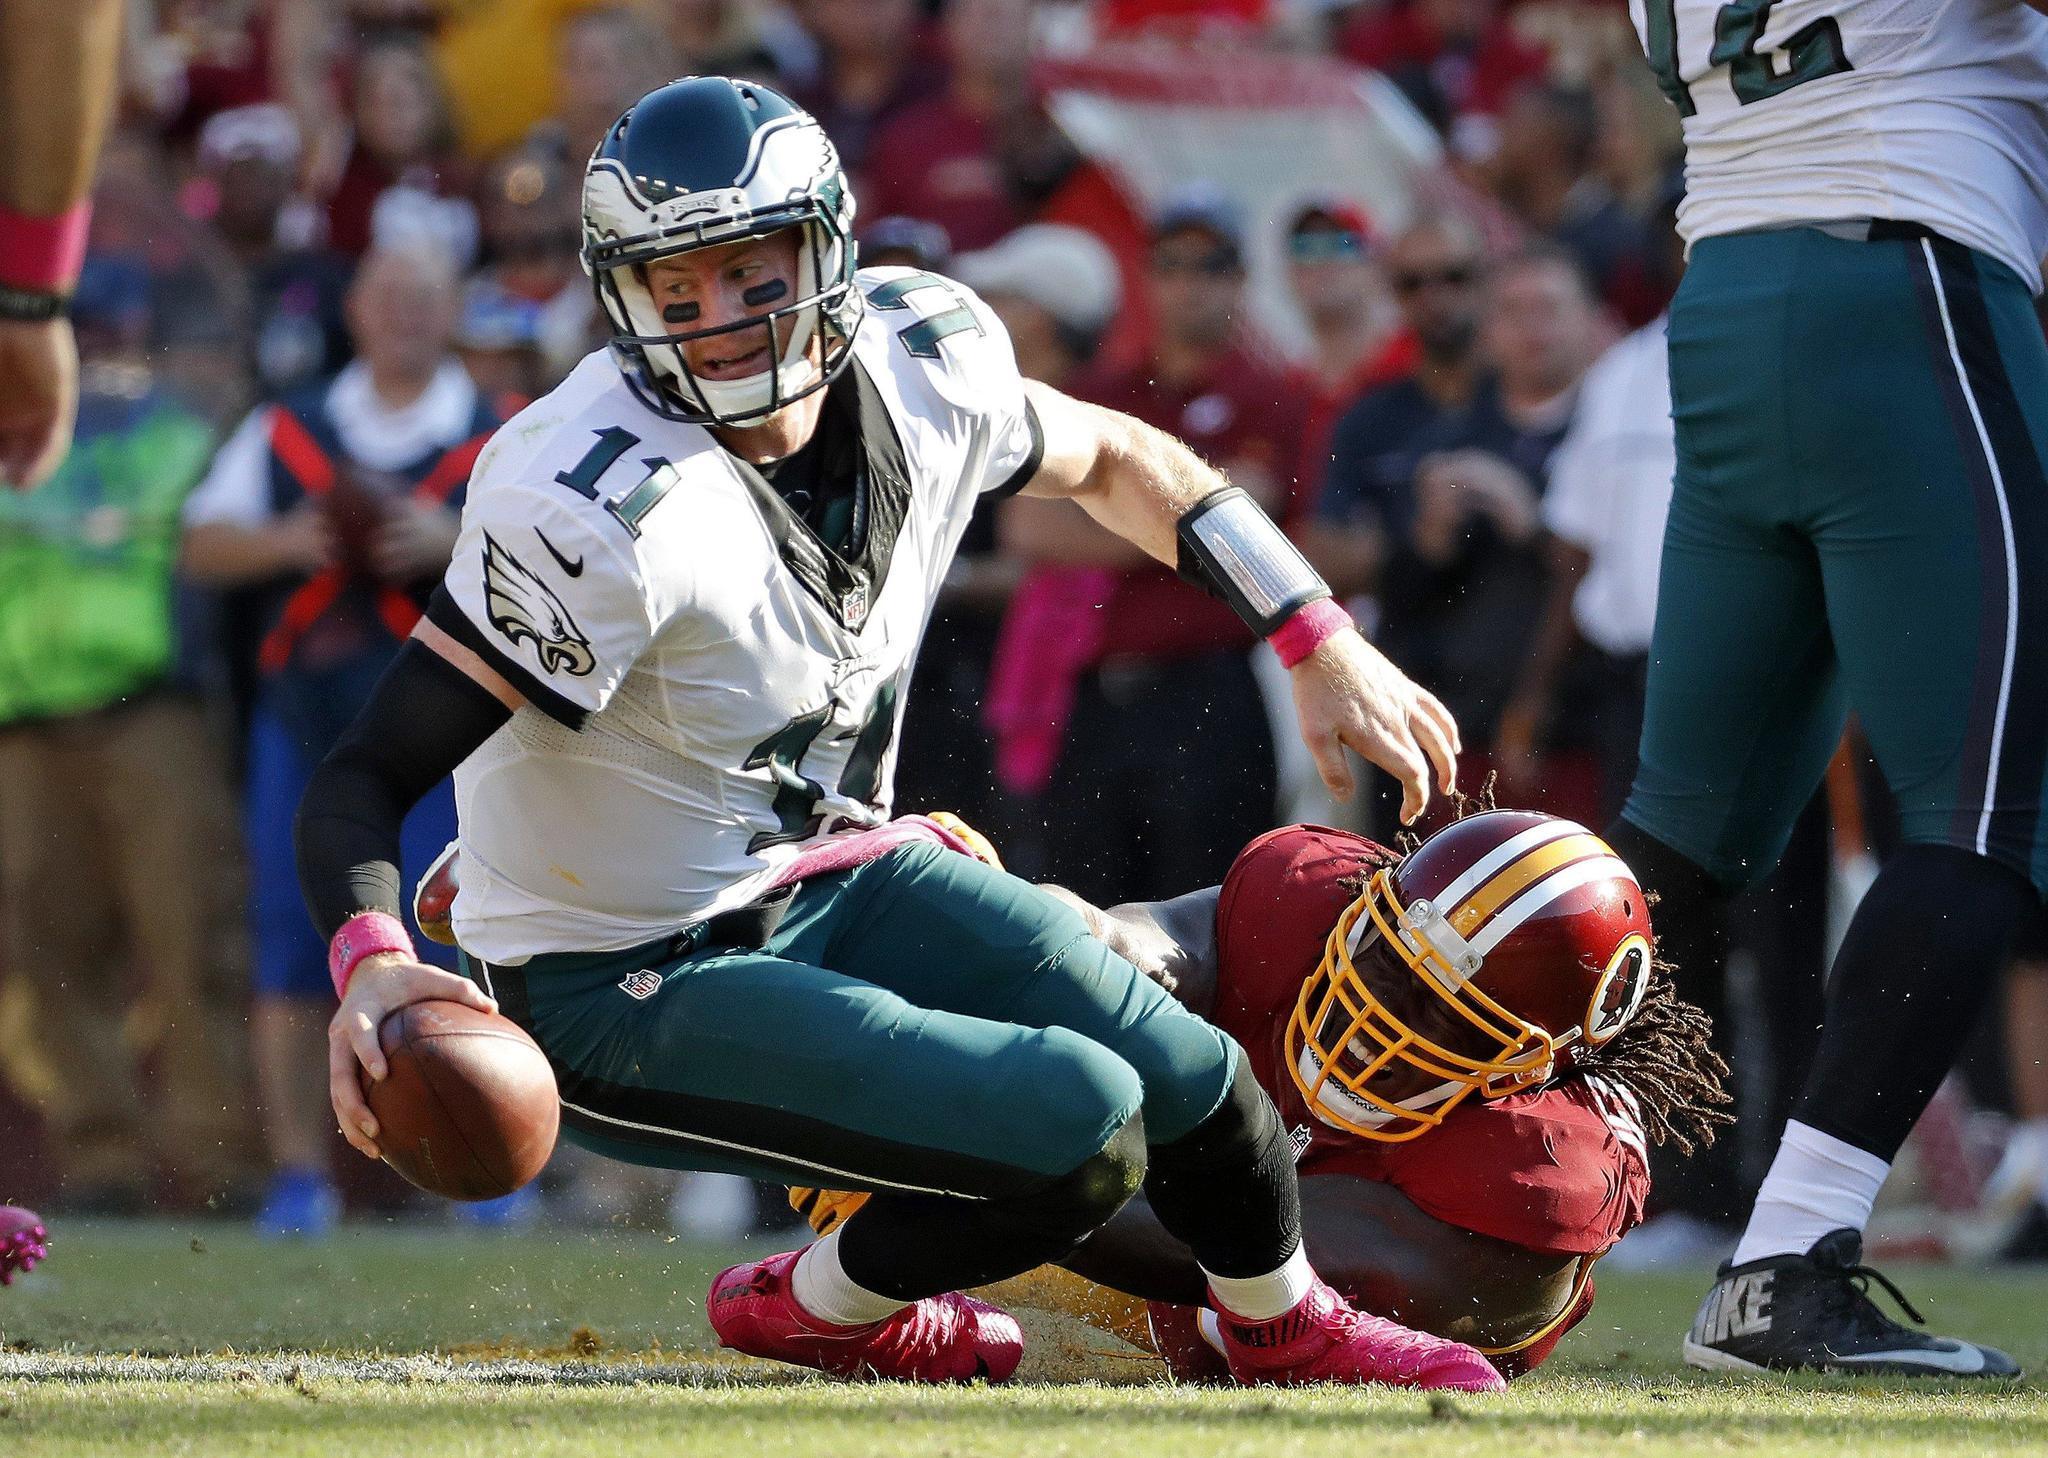 Mc-eagles-pass-defense-1017-20161017